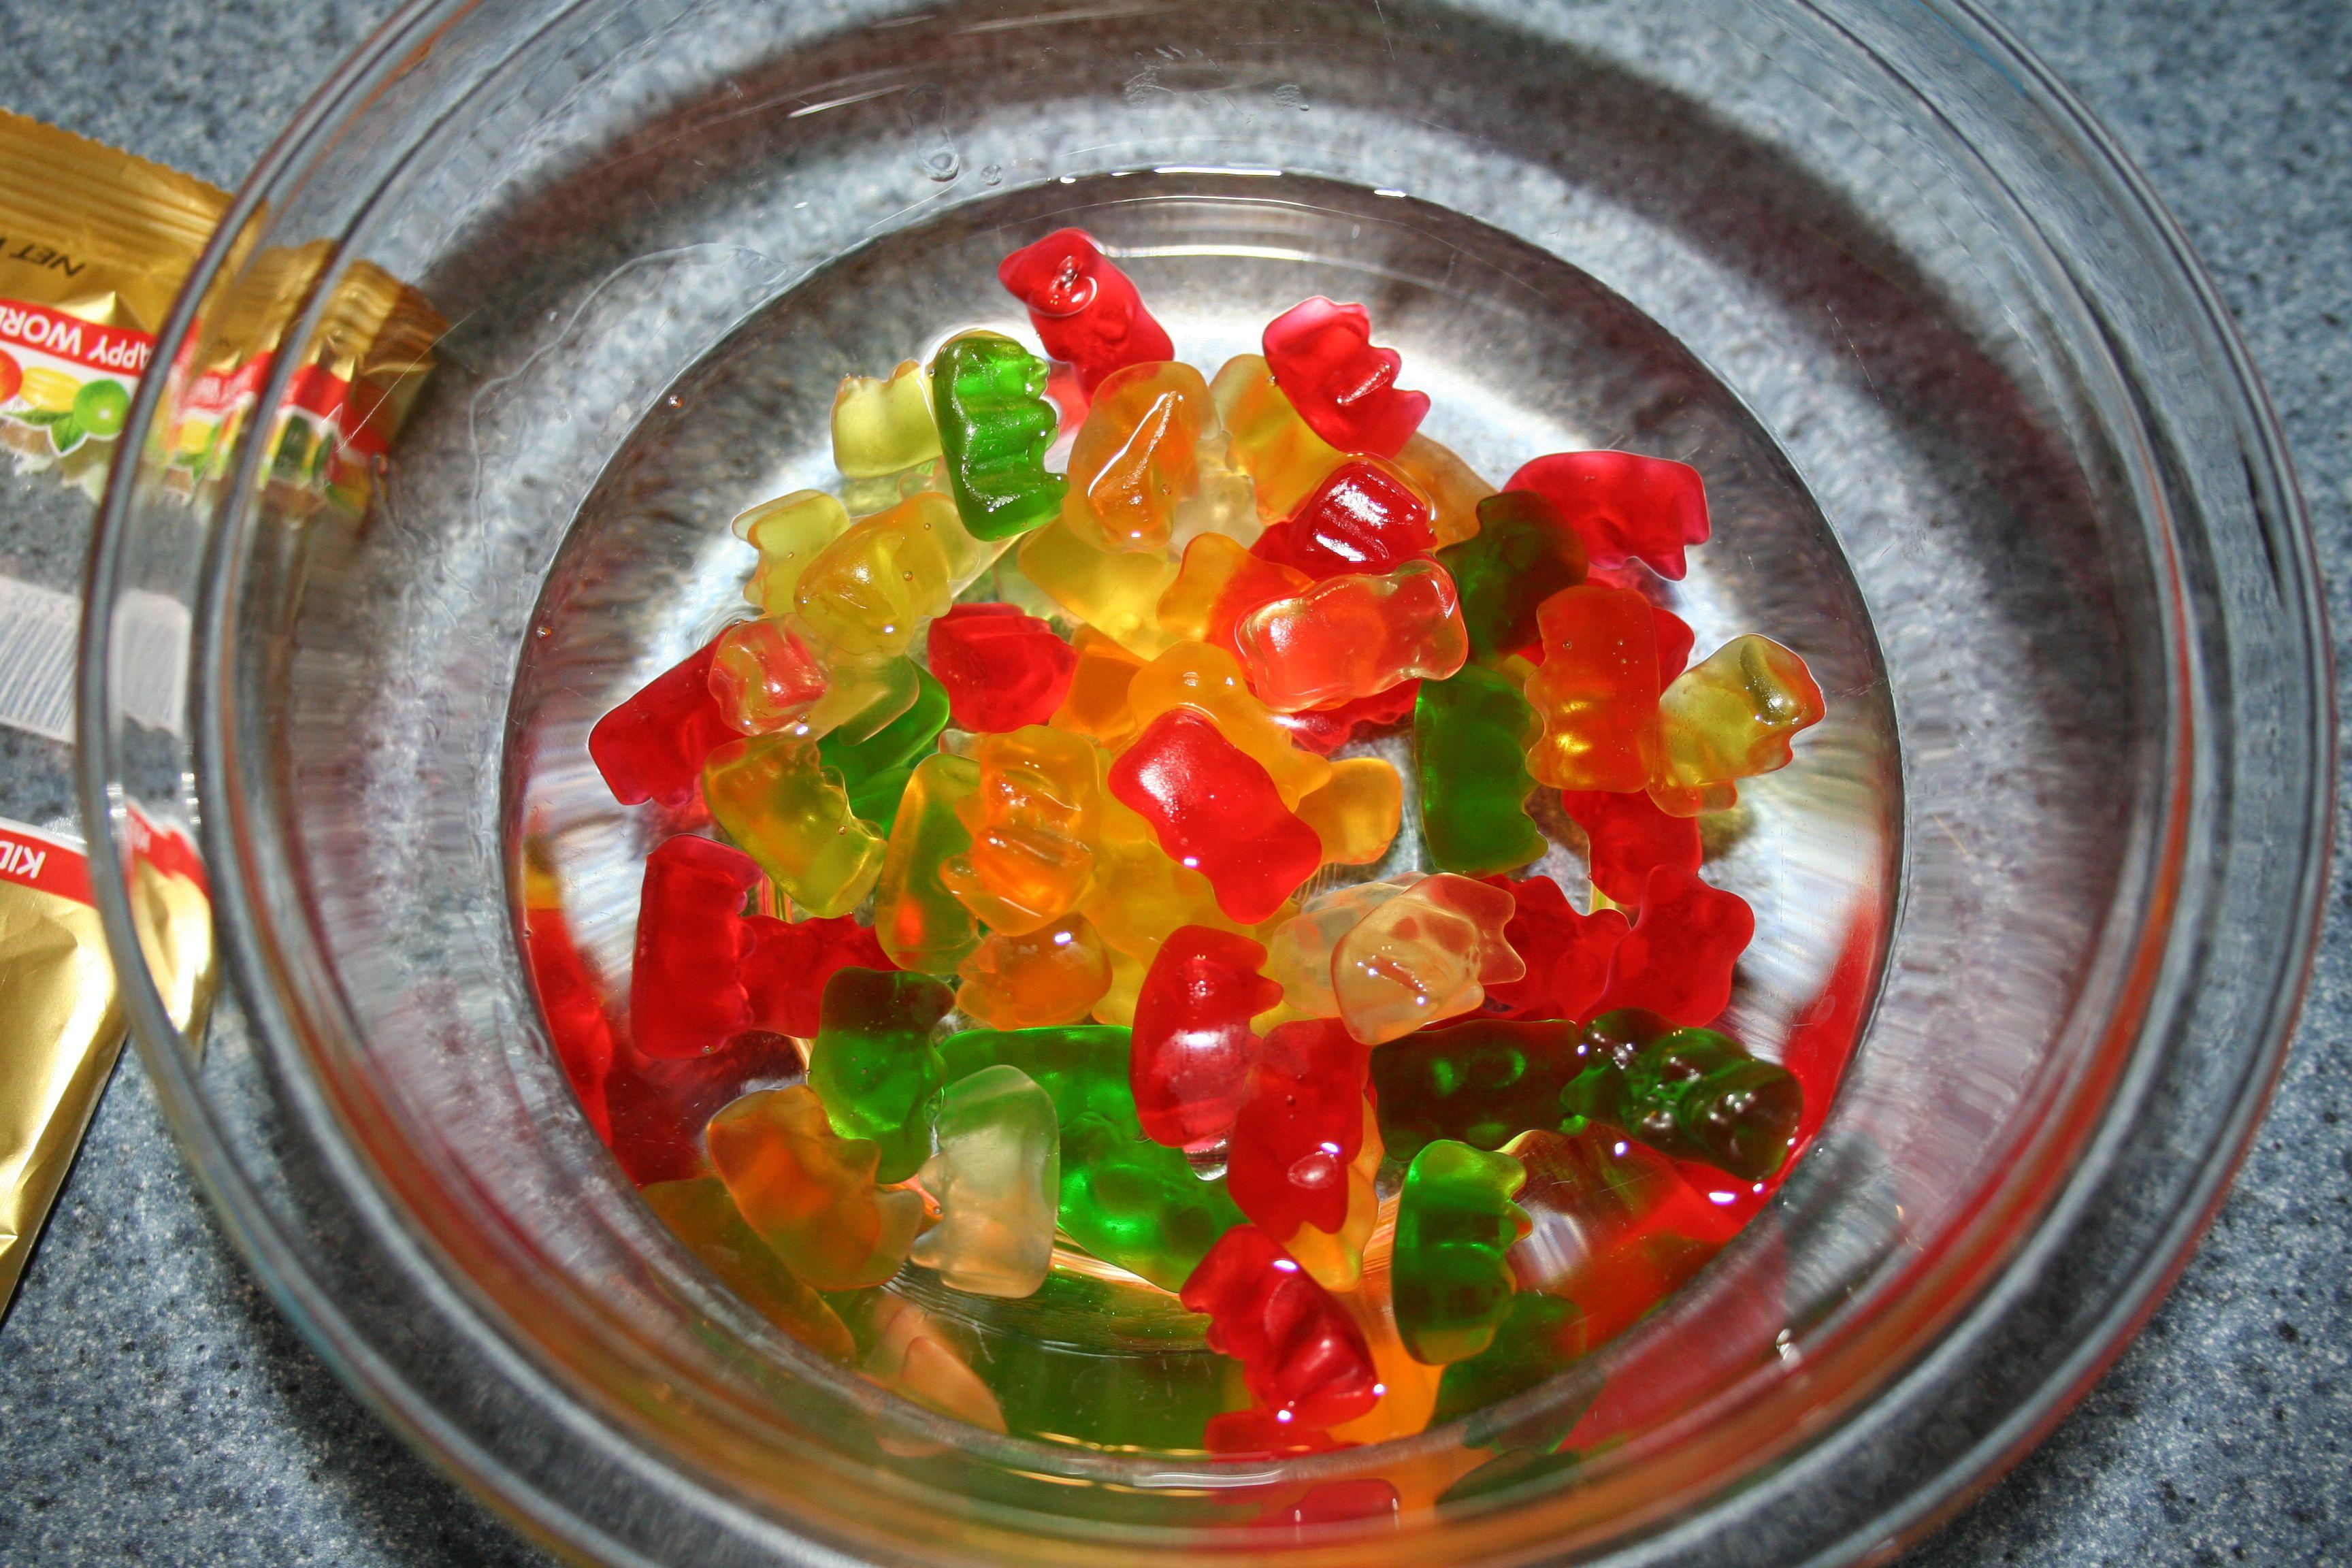 How to make vodka gummy bears vodka gummy bears how to